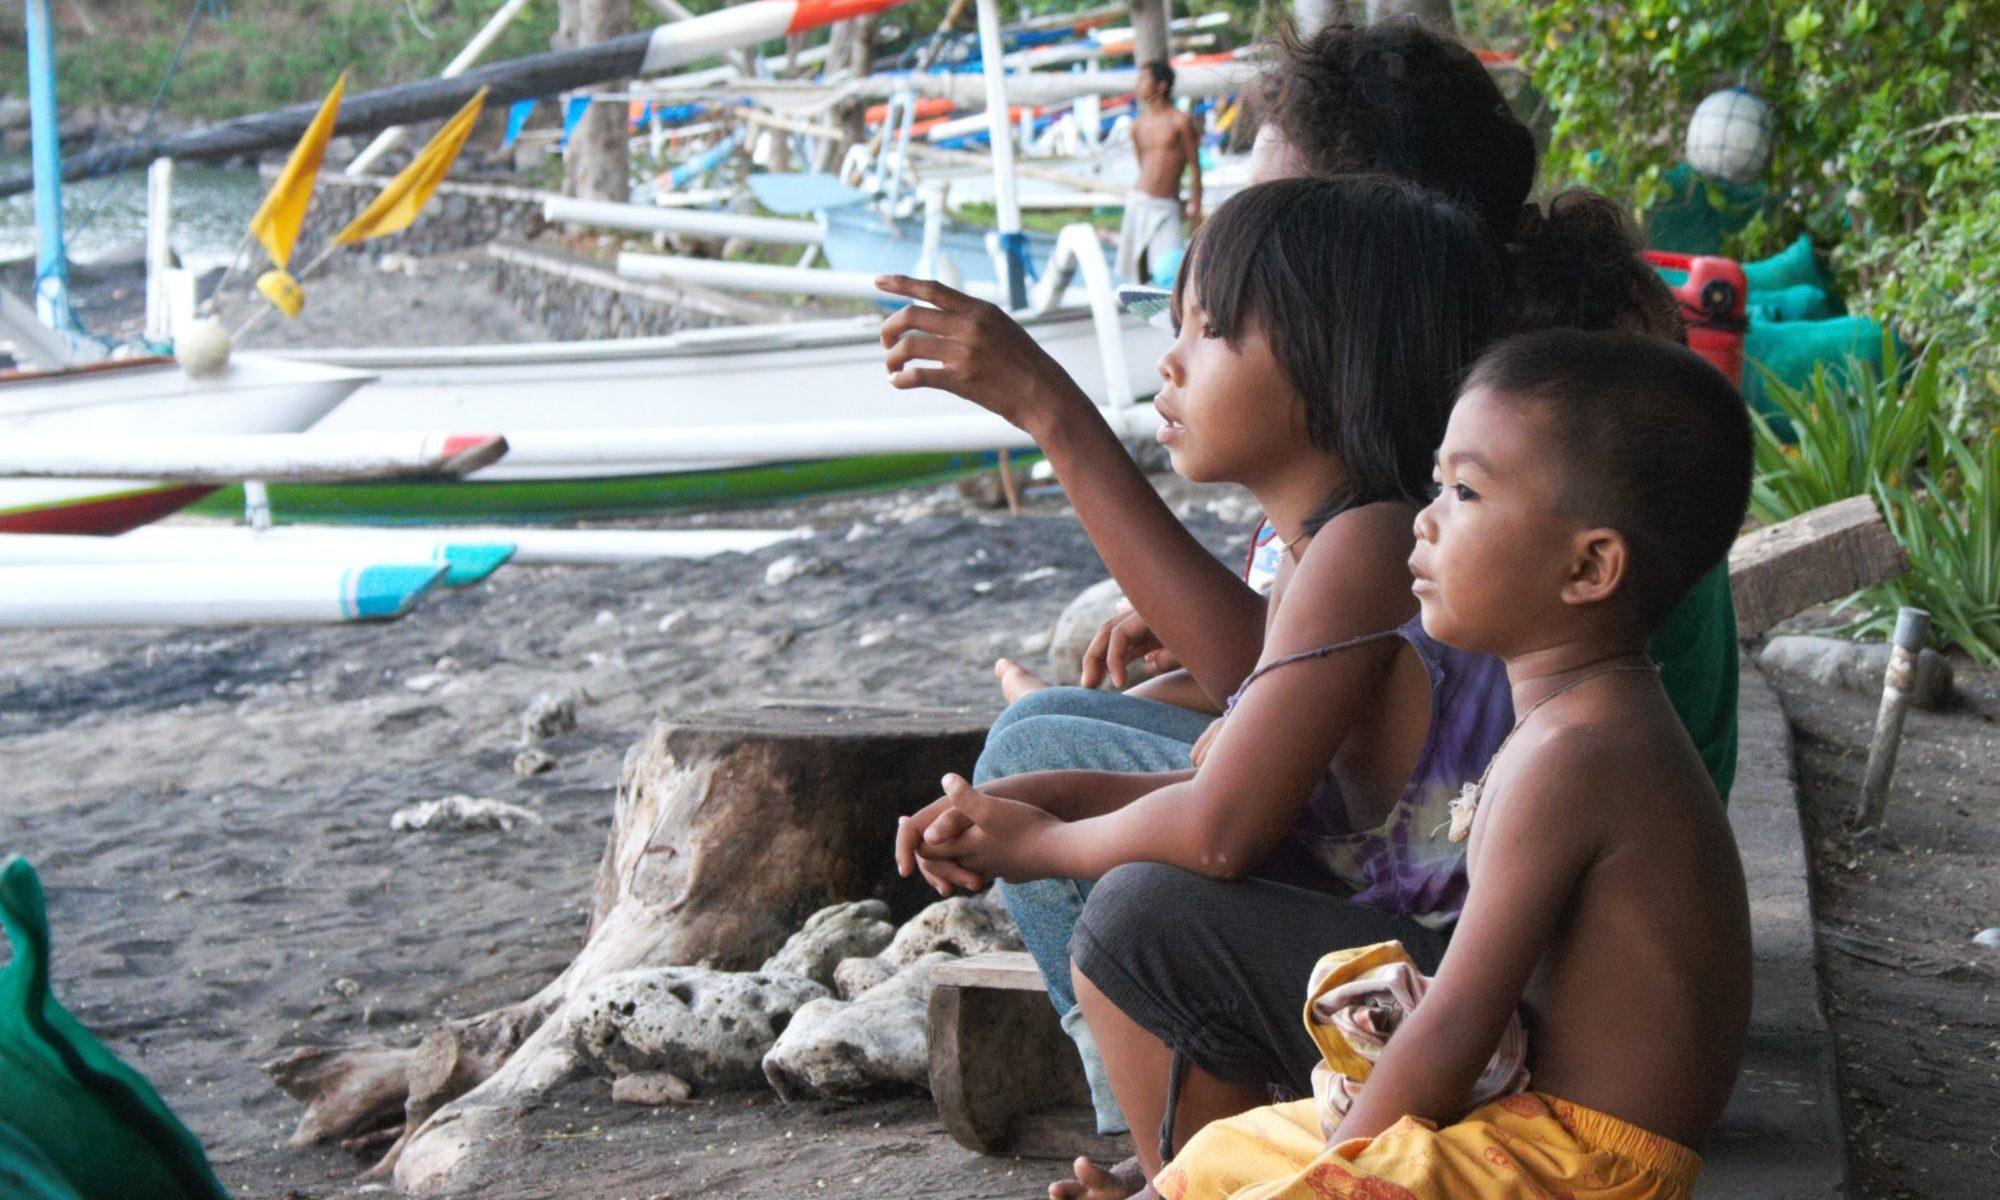 cropped bali good karma amed 2000x1200 - Bali: Korruption gibt es wirklich - at the airport